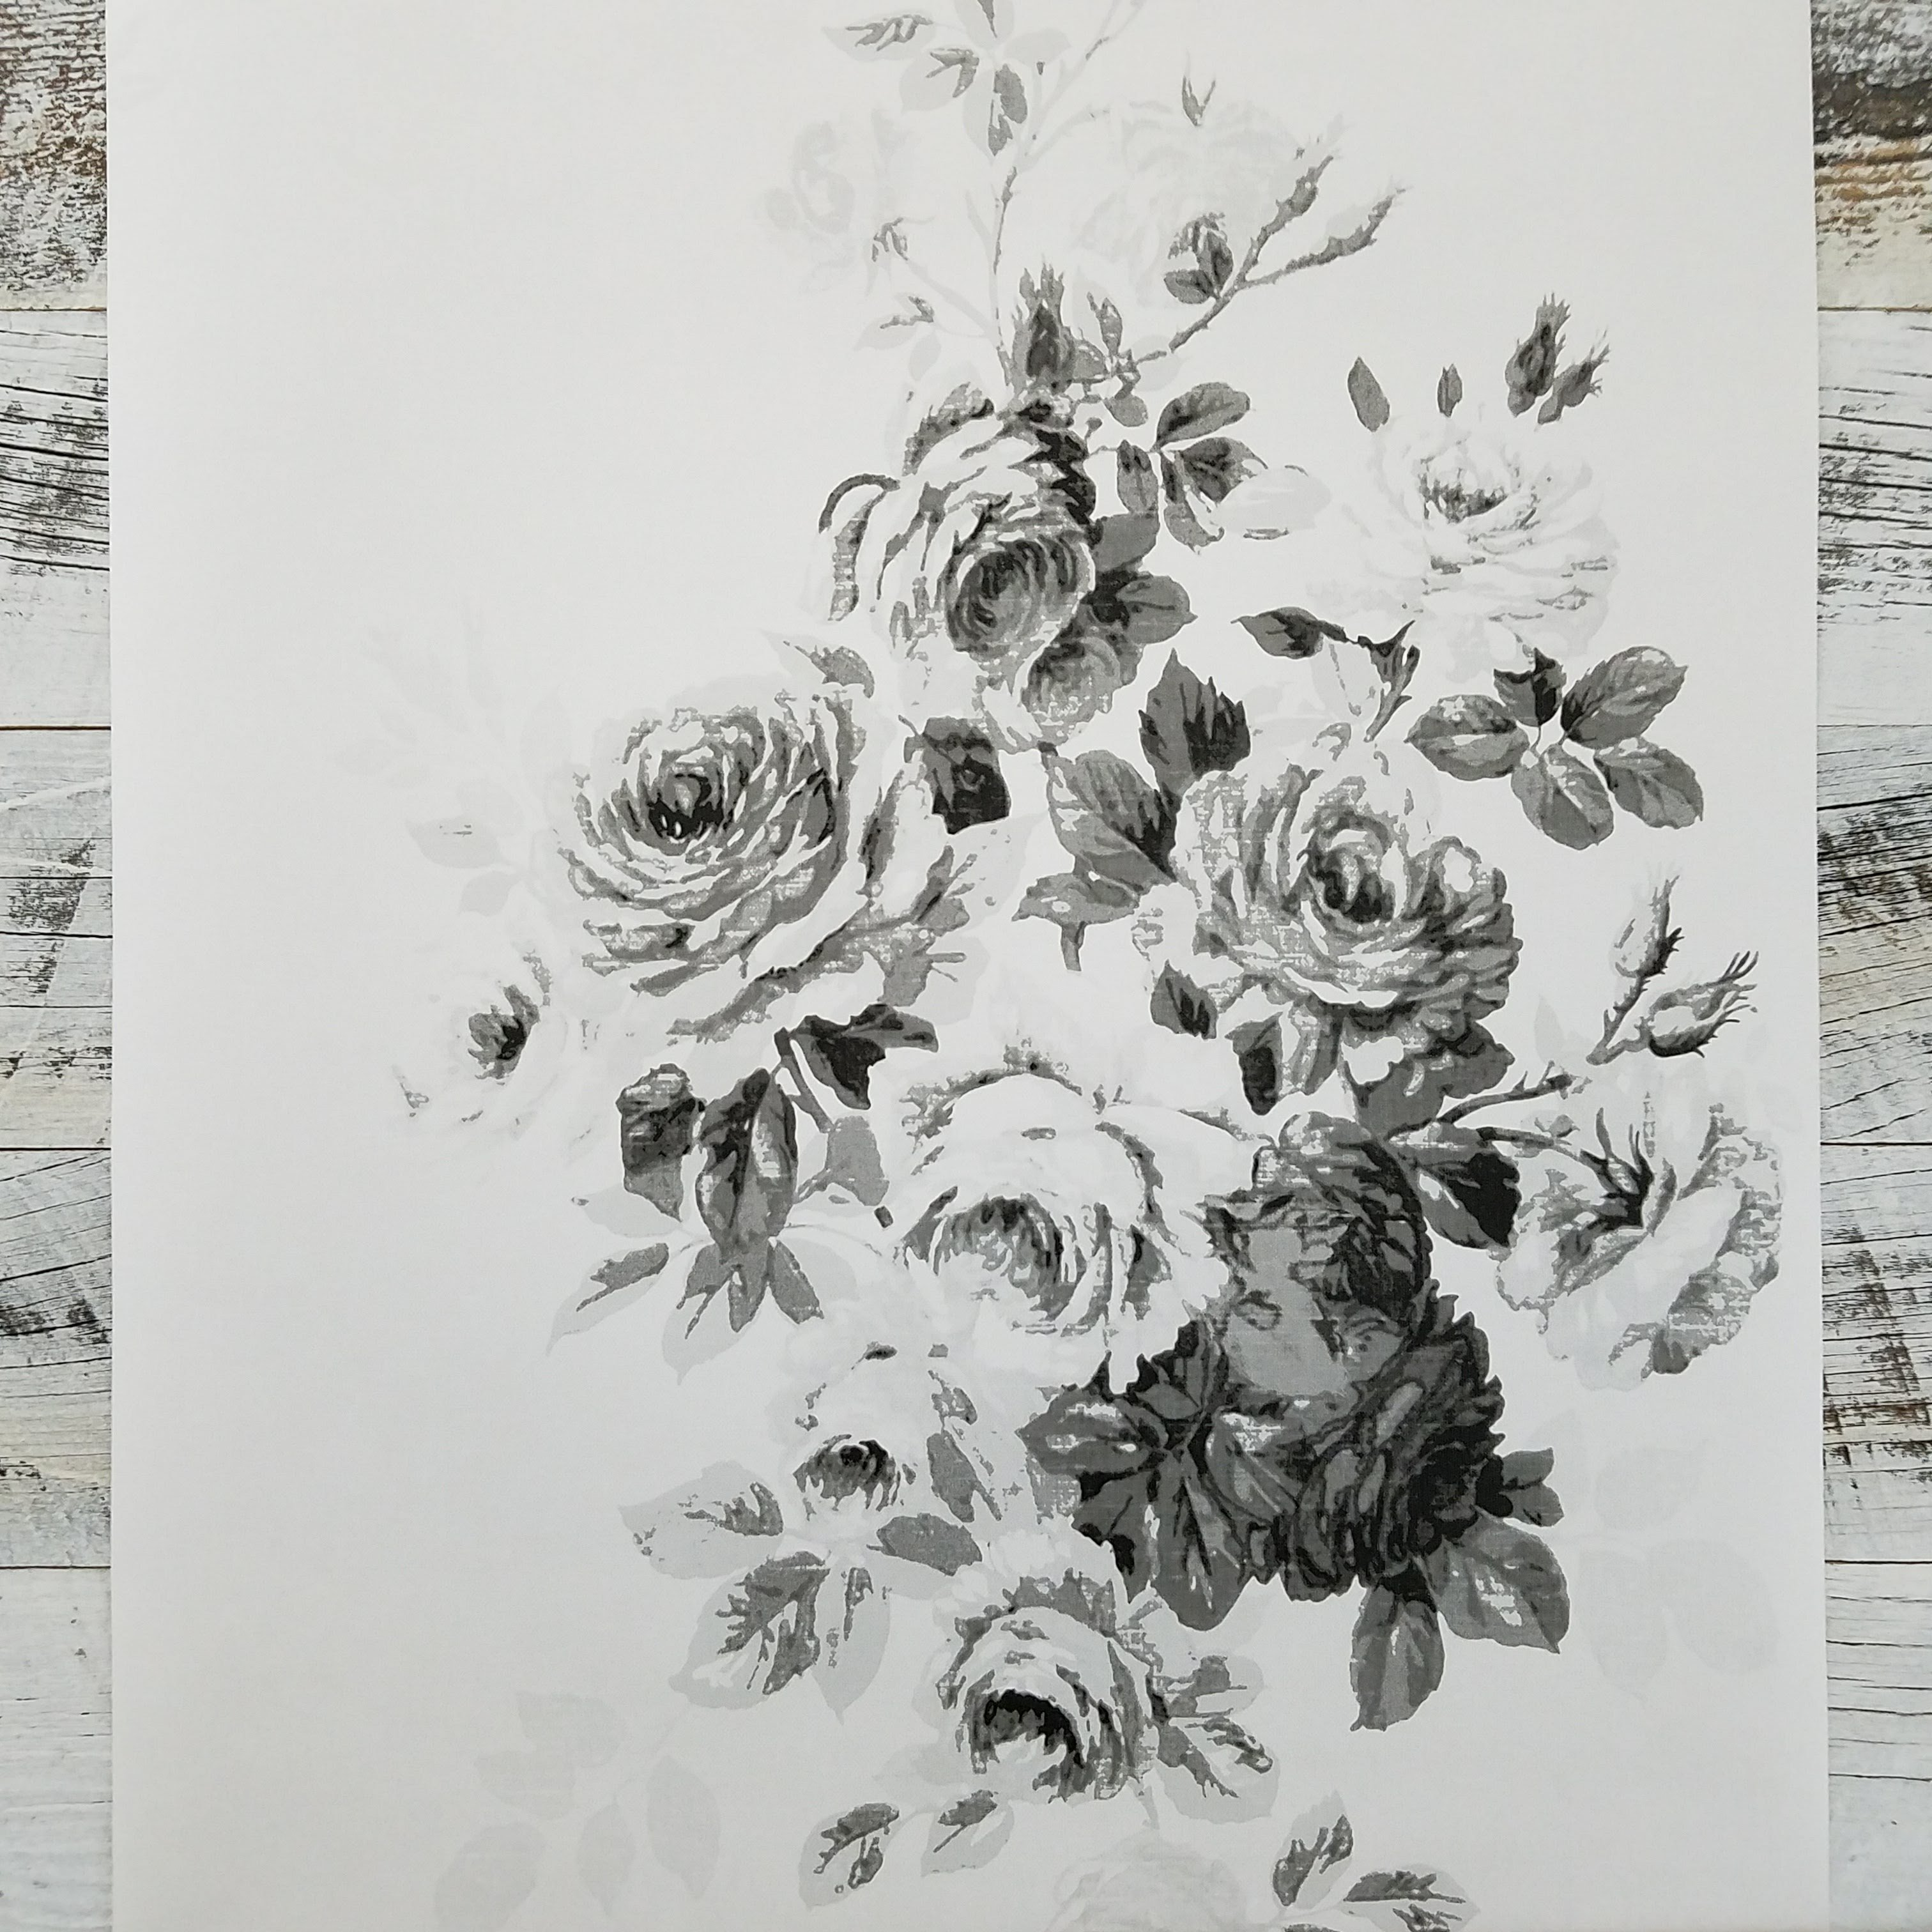 Magnolia Home Tea Rose White and Black Floral Wallpaper